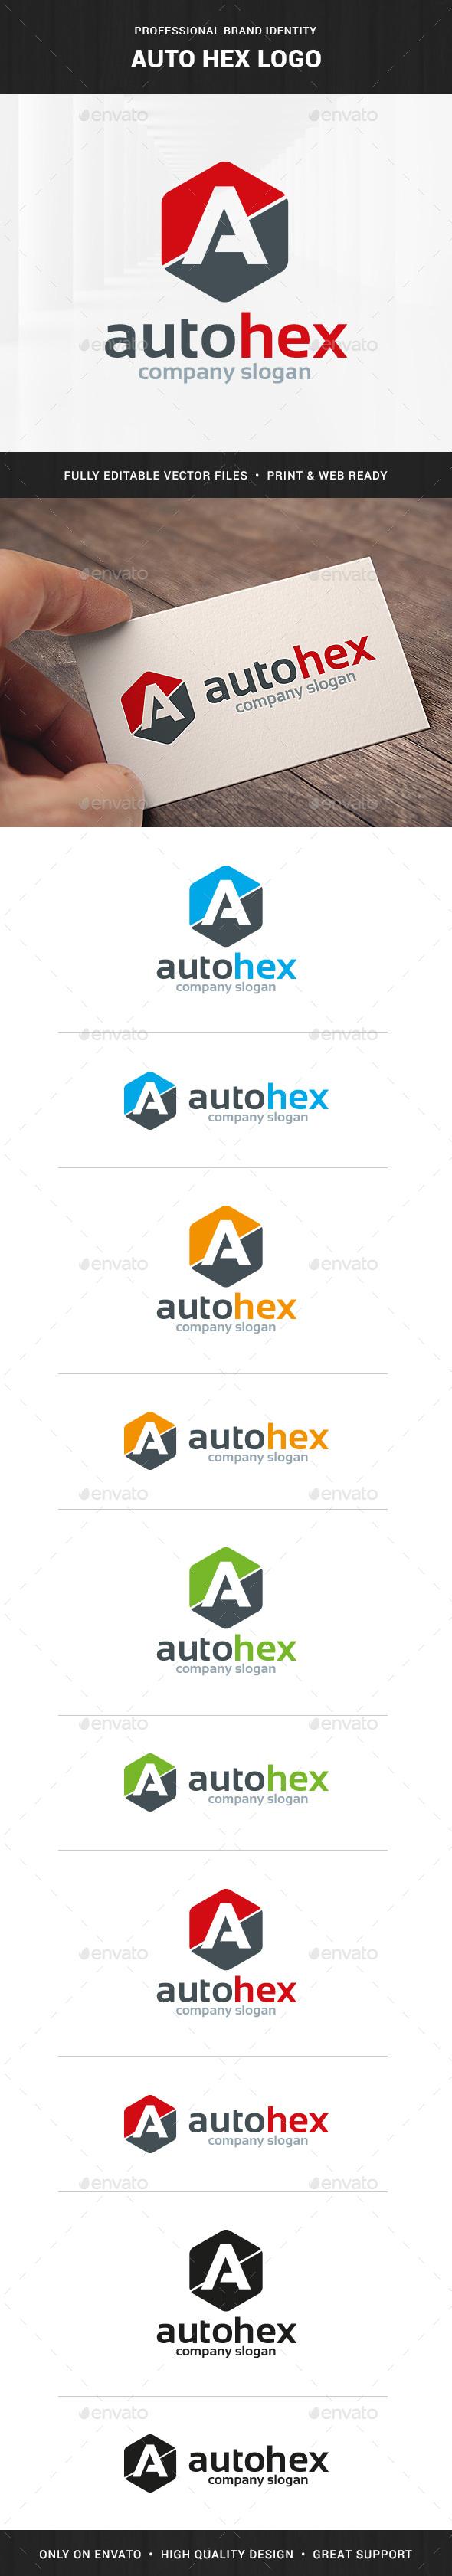 Auto Hex - Letter A Logo